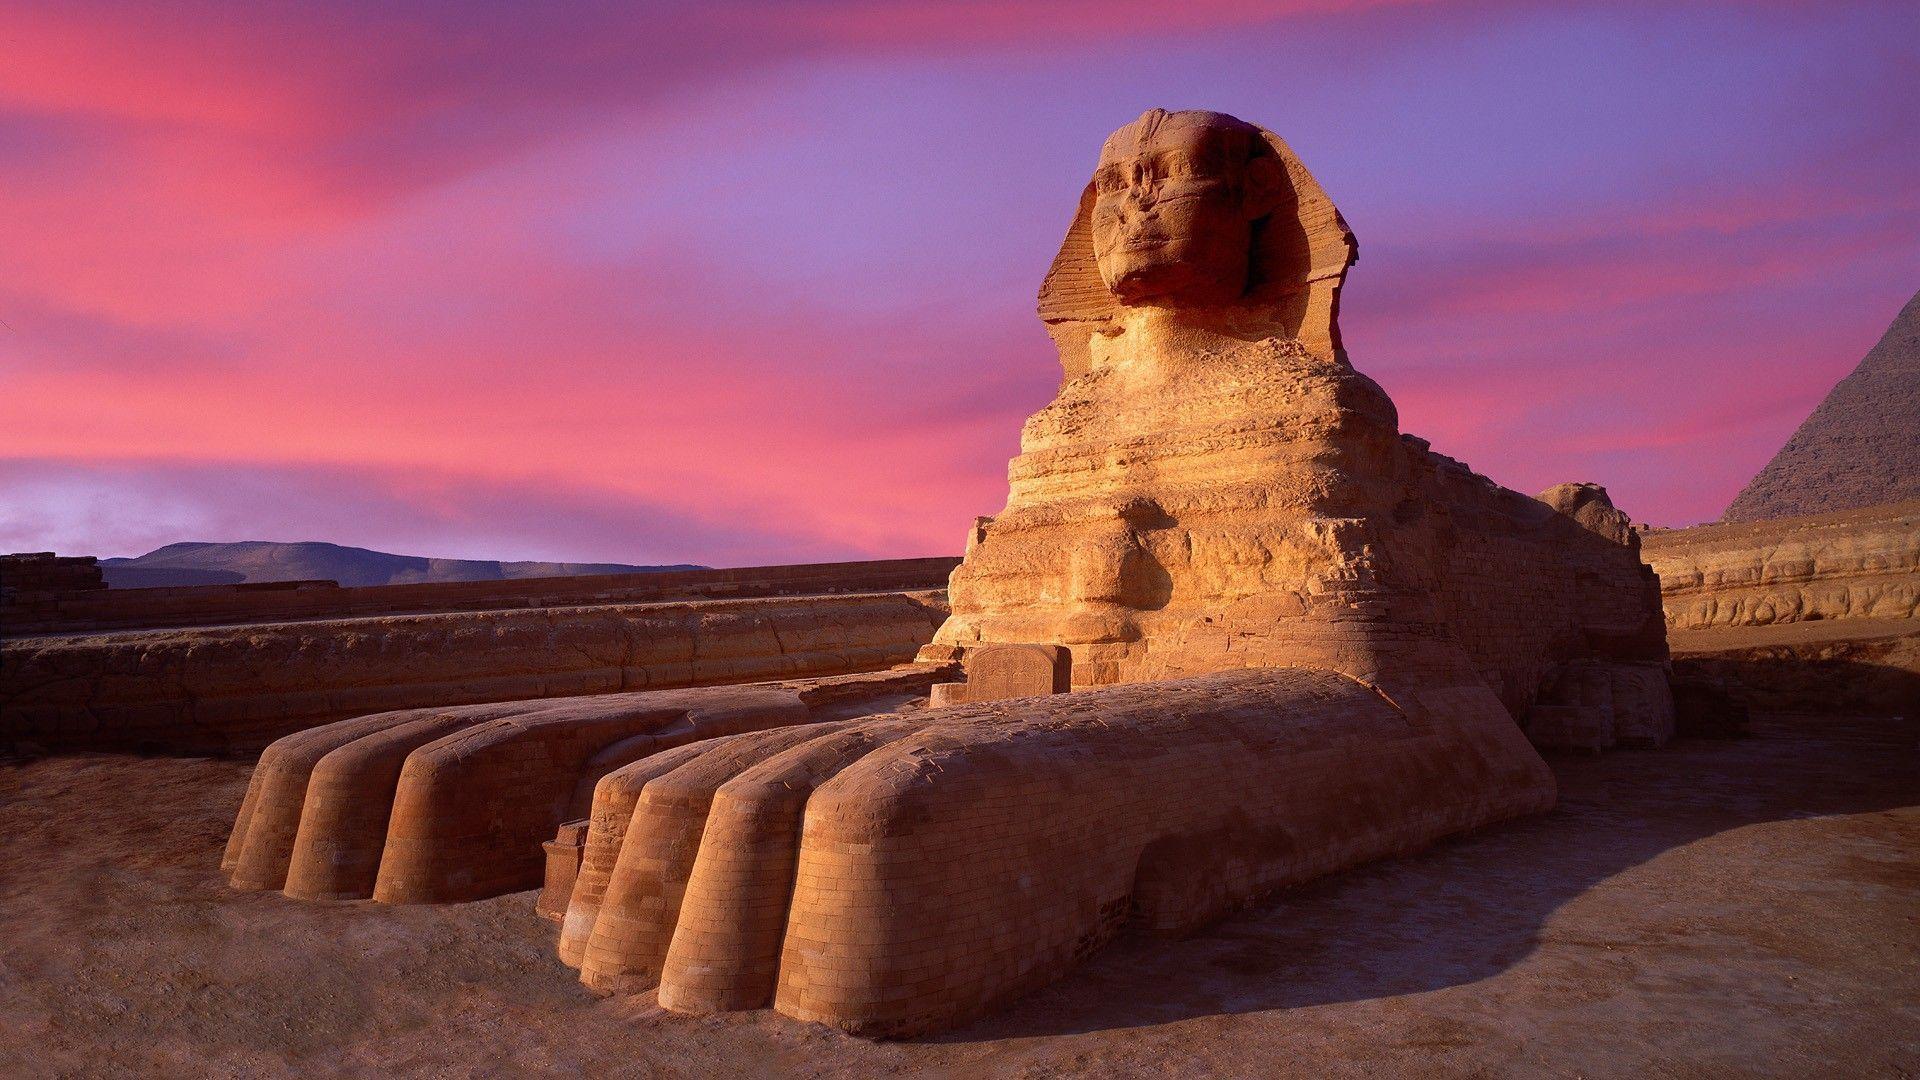 egypt photographs